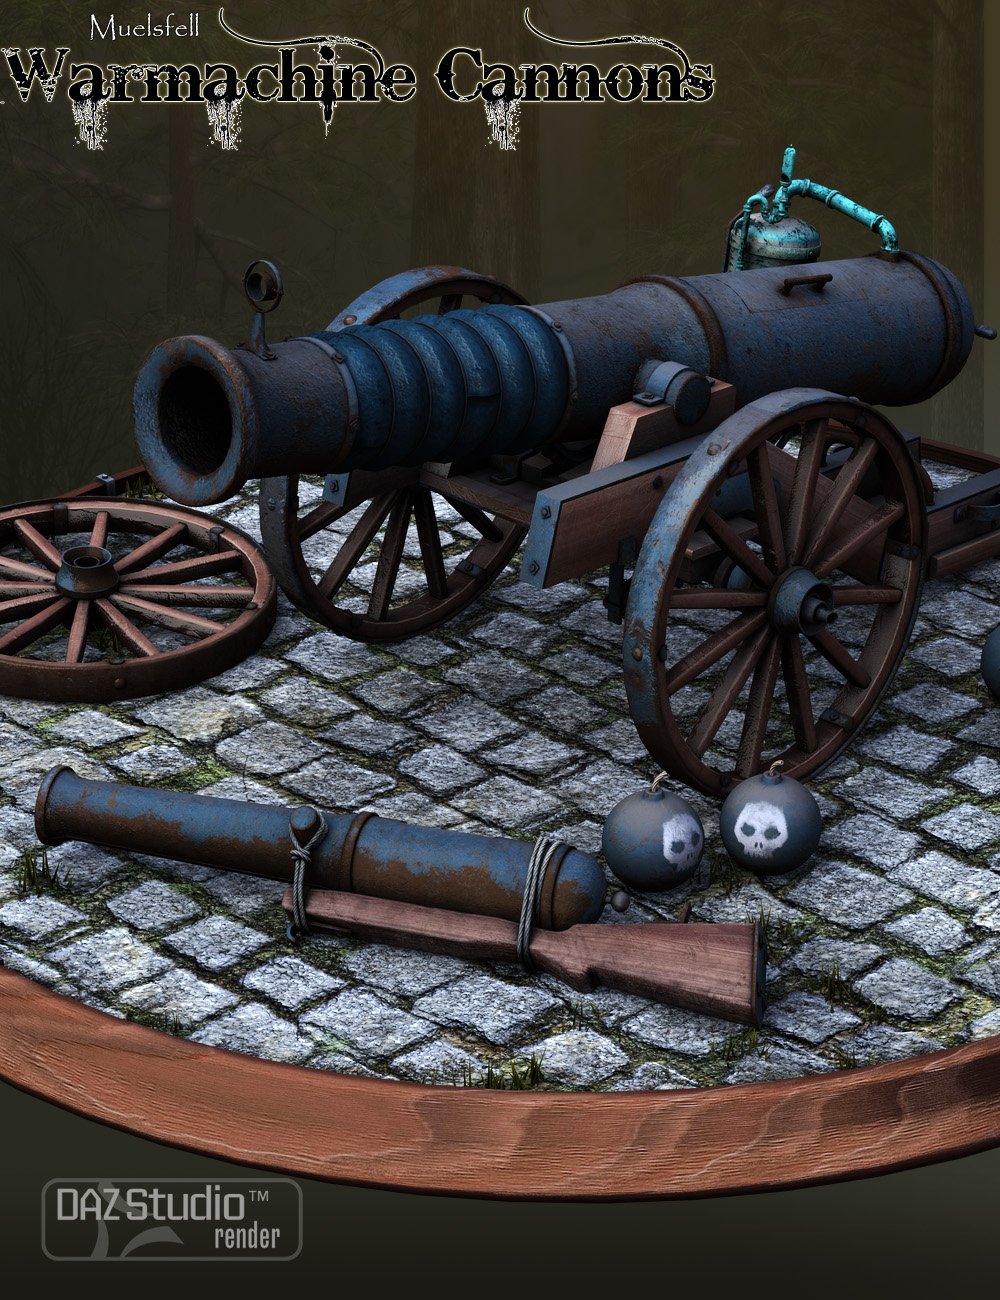 Muelsfell Warmachine Cannons by: E-Arkham, 3D Models by Daz 3D